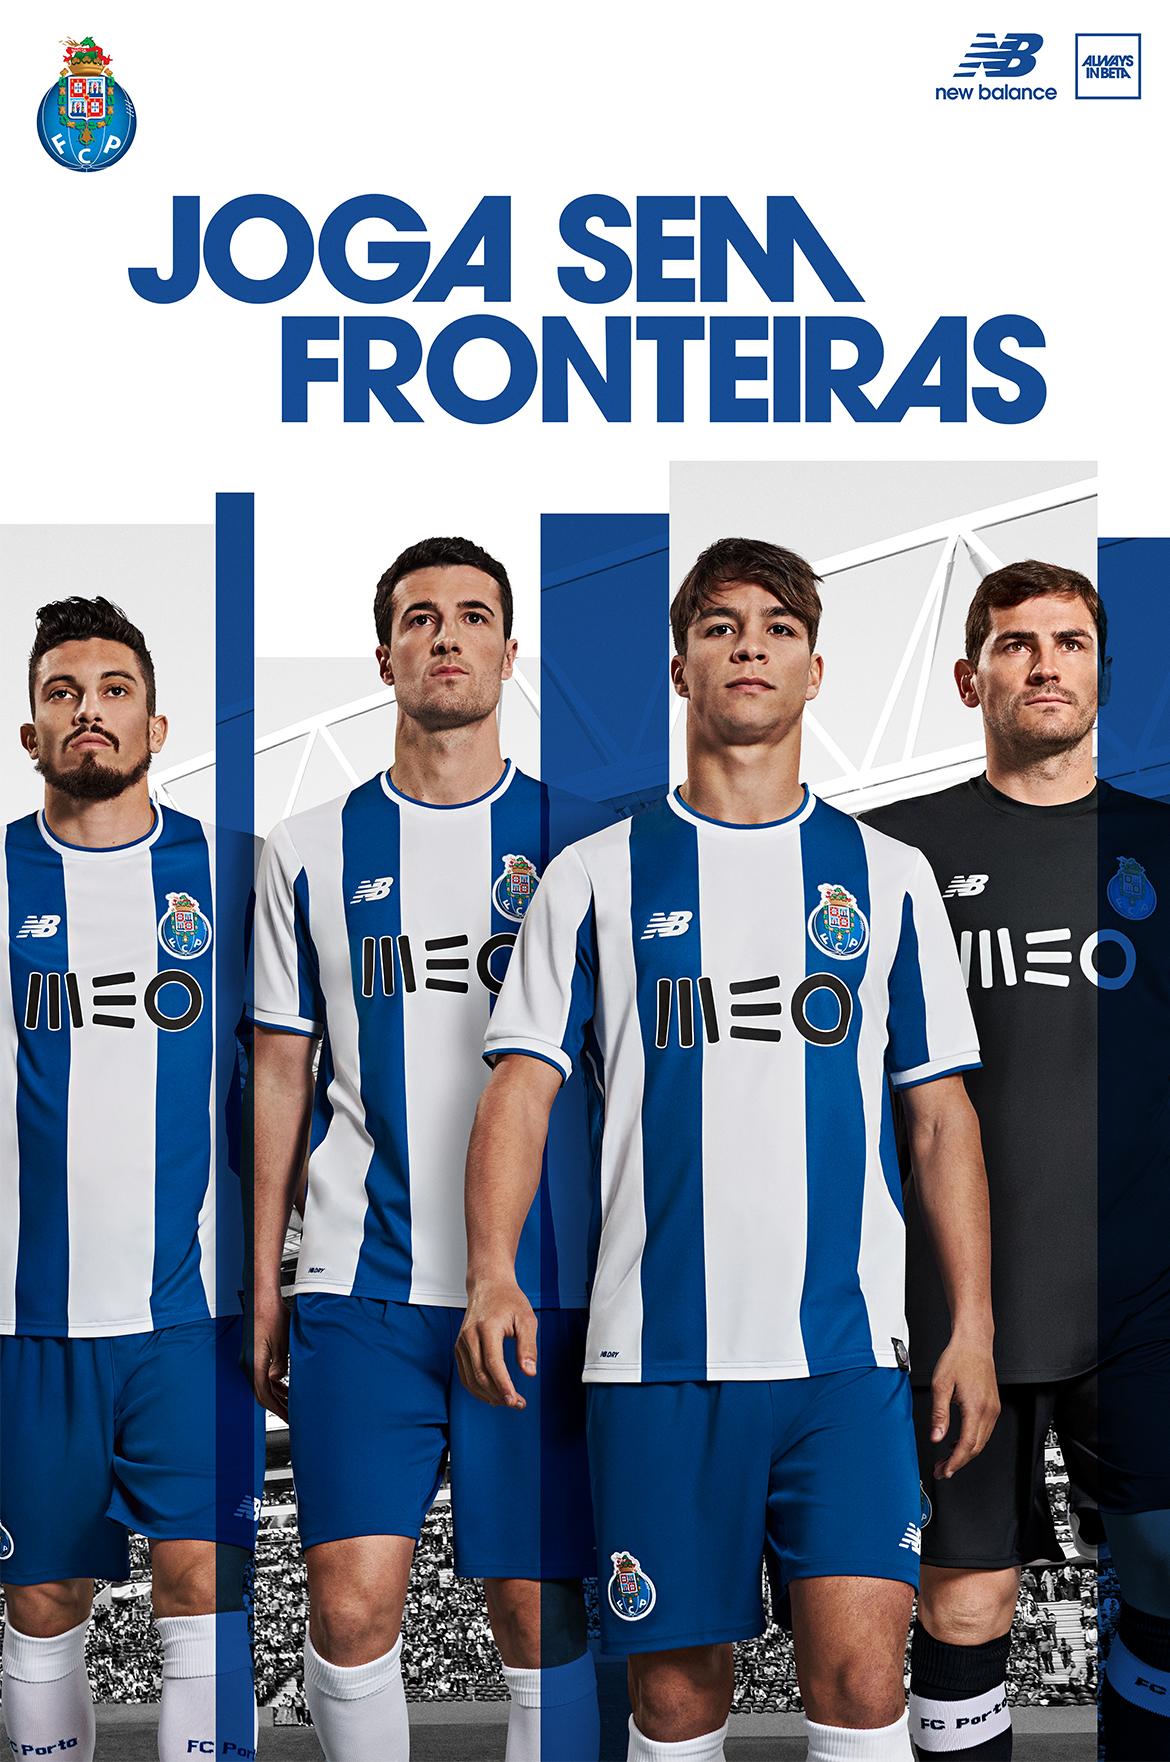 nbfootball_porto1718_home_keyart_2.jpg